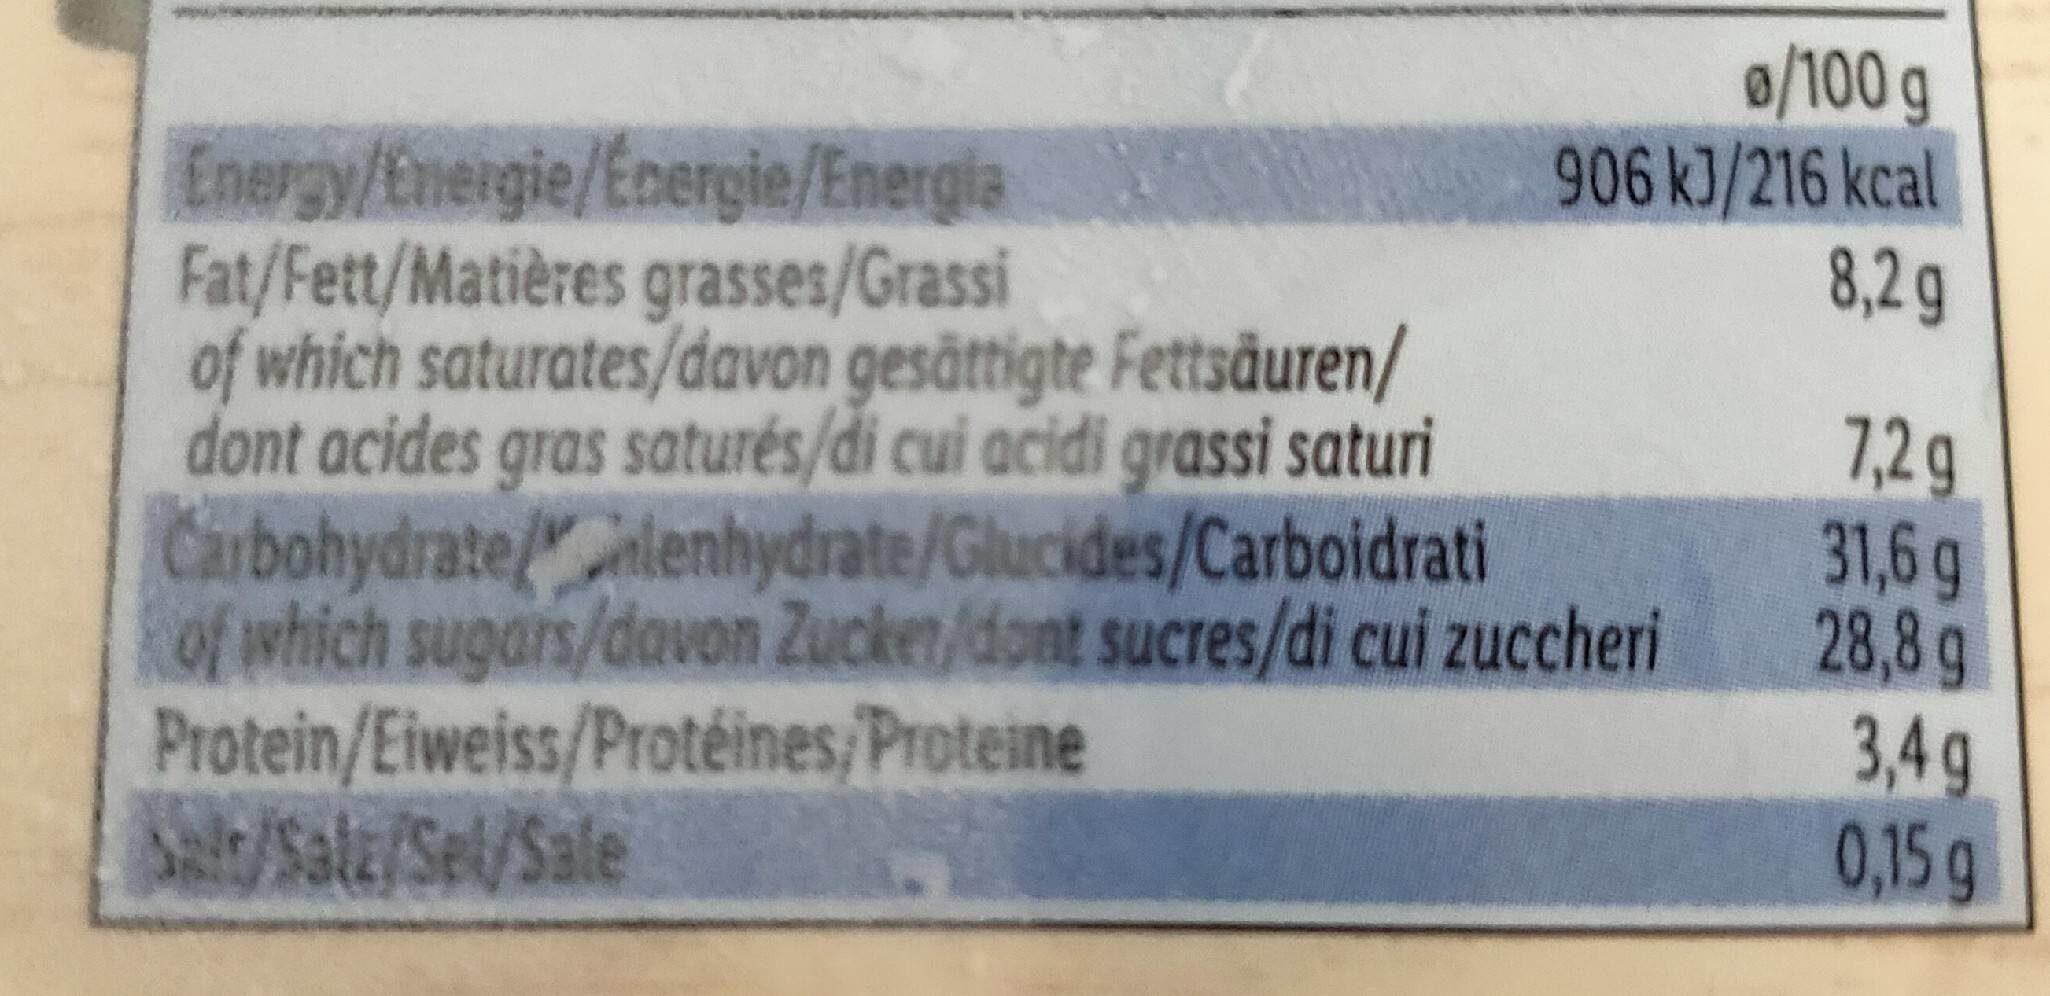 Noblissima Creme Brulee - Nutrition facts - fr